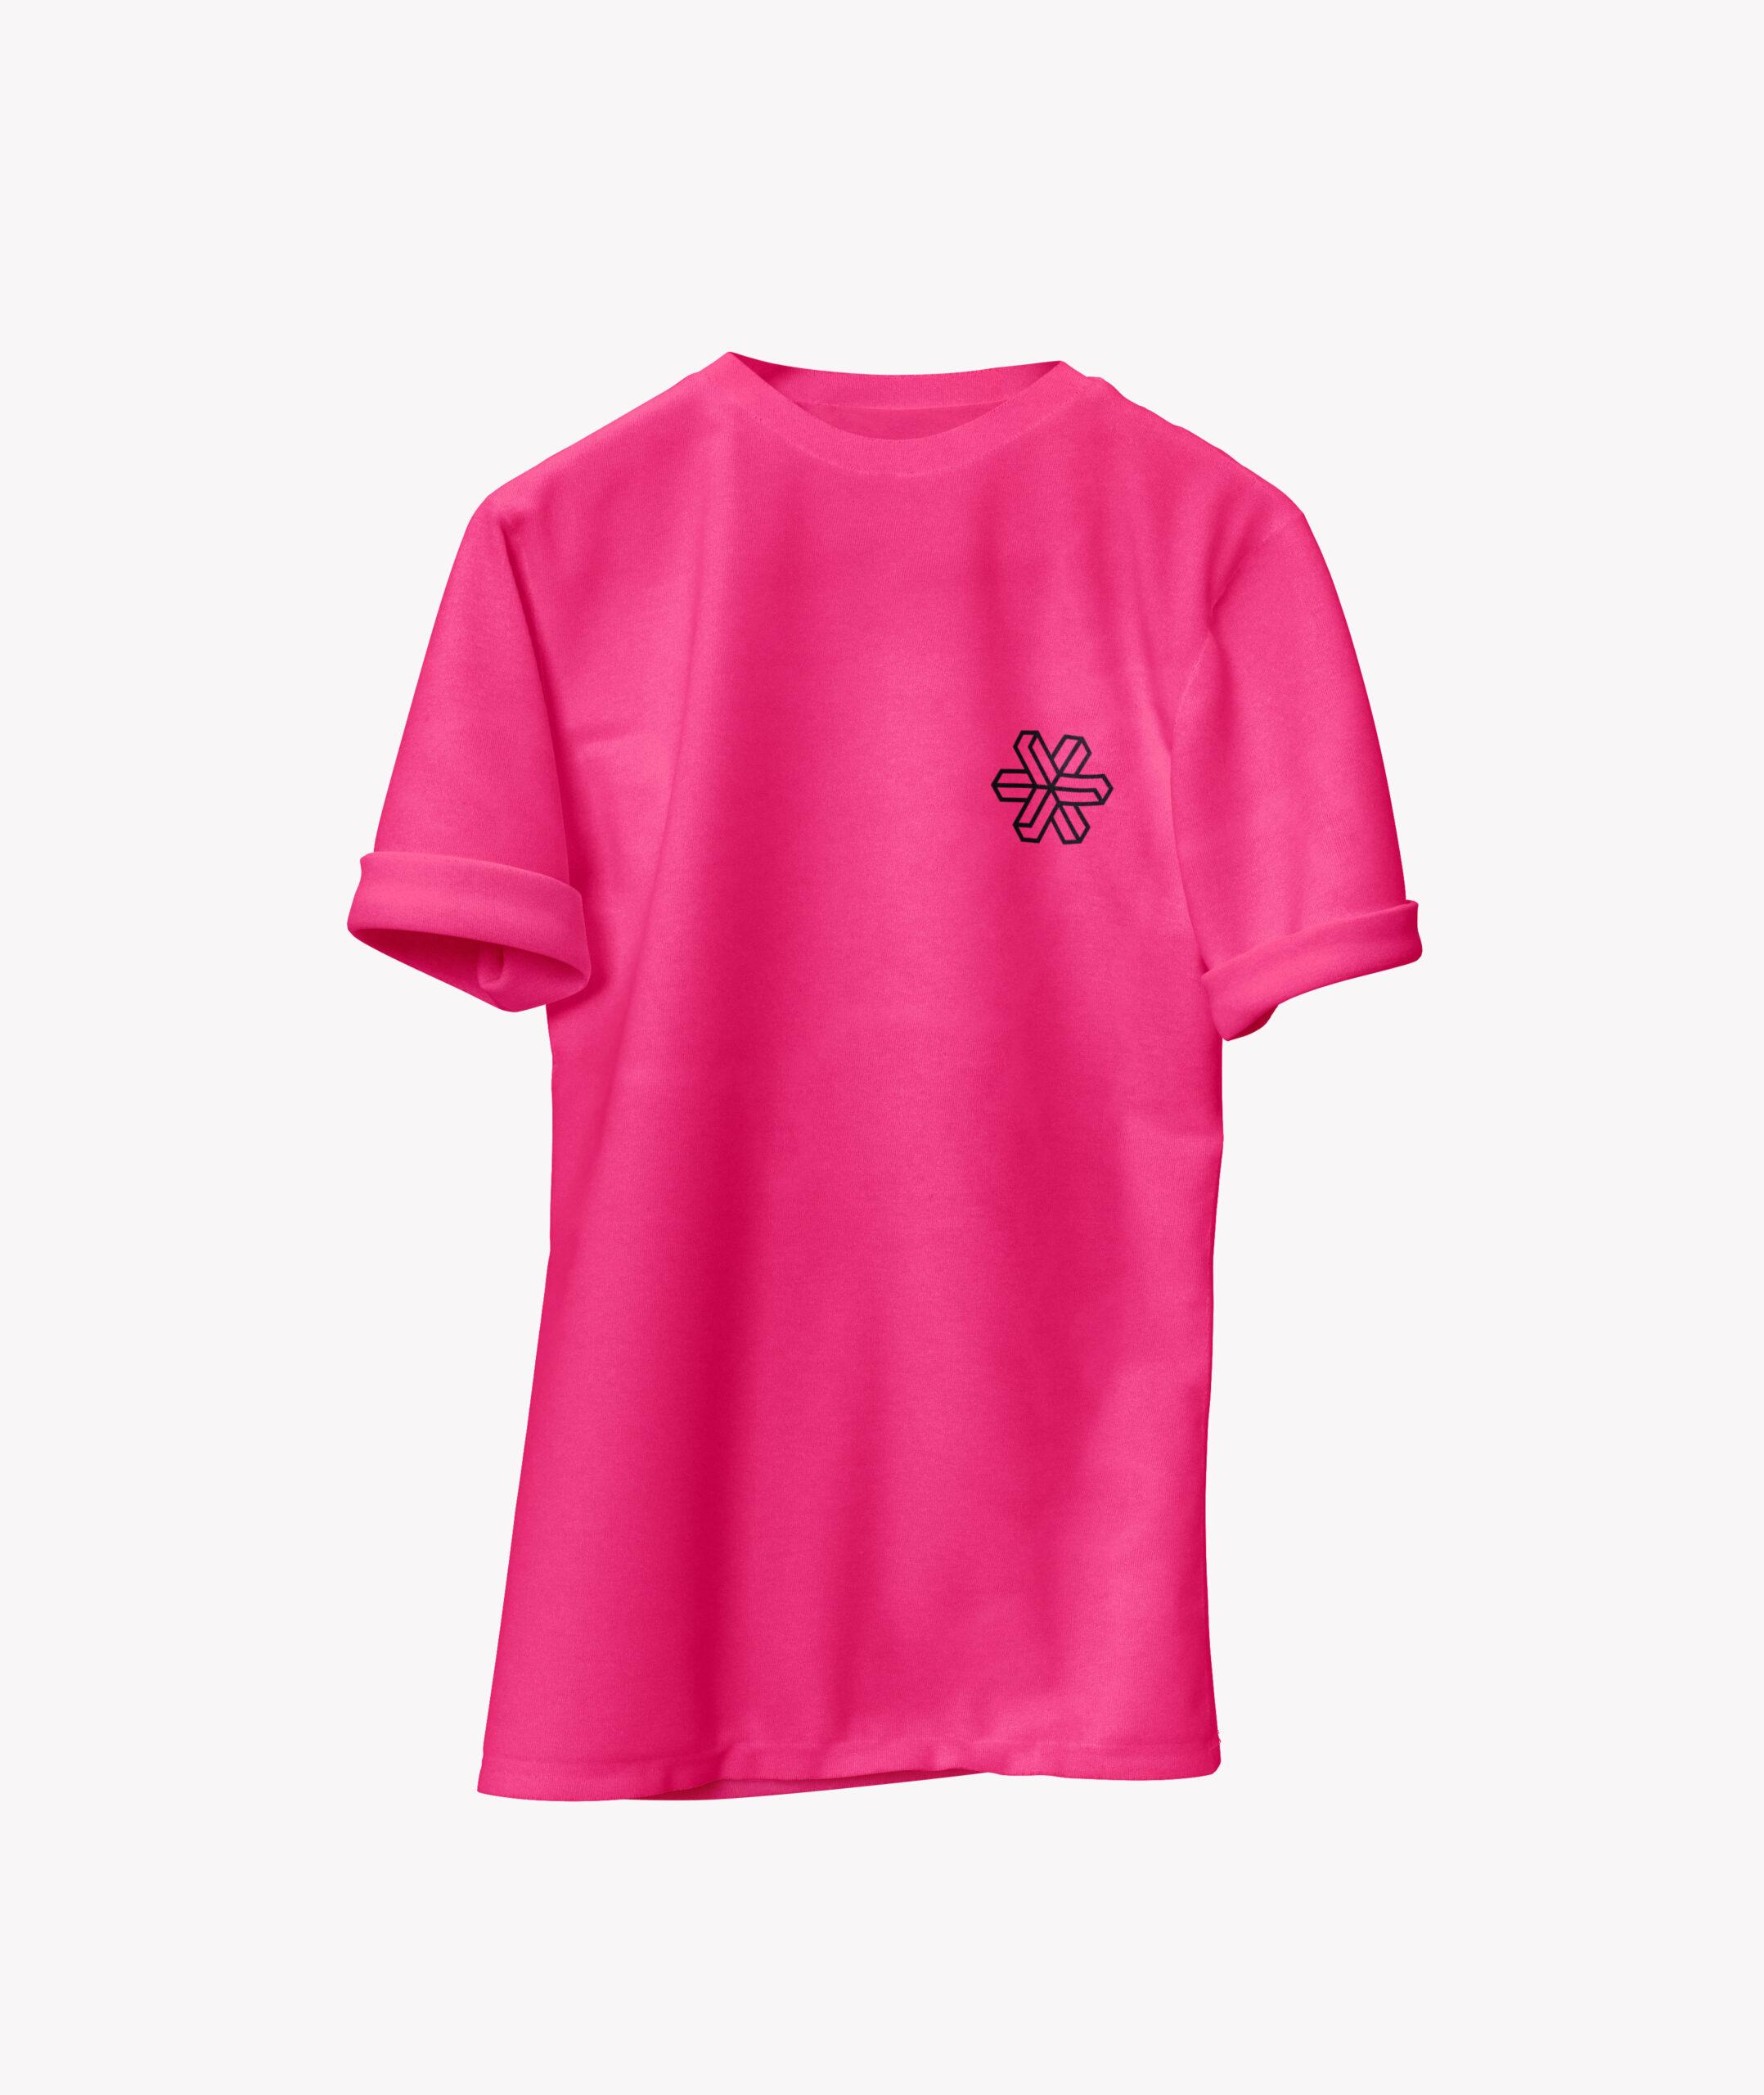 Edgeware t-shirt design in pink